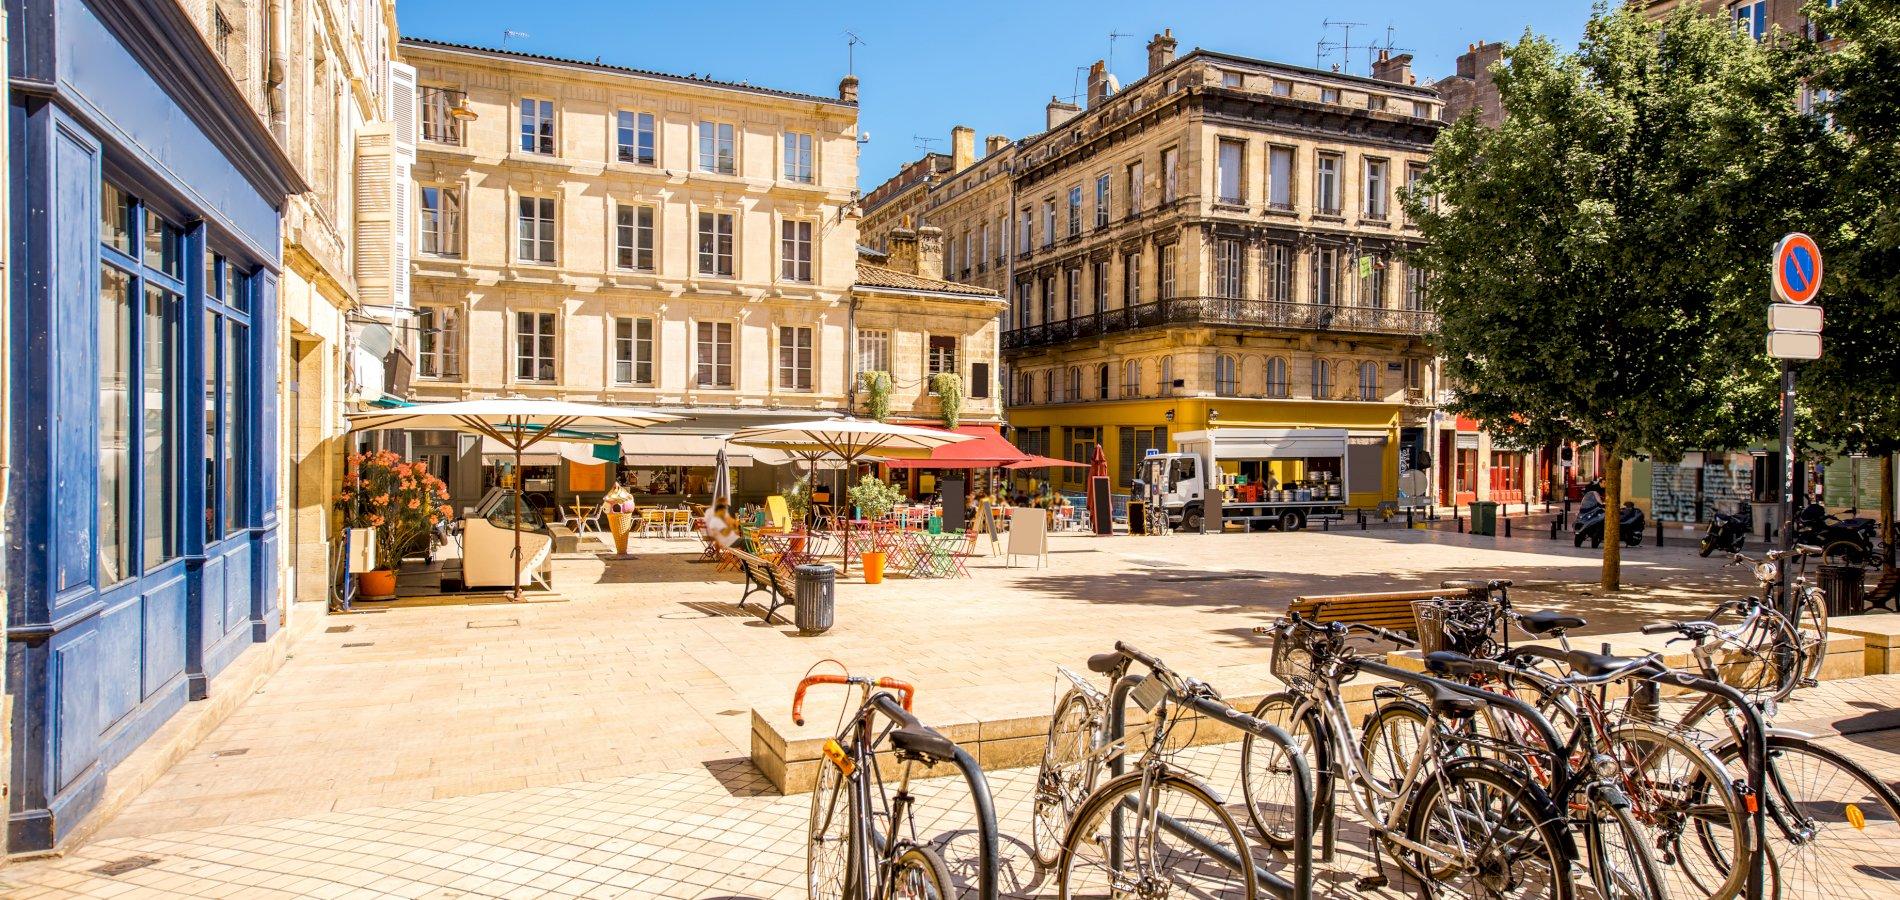 Ophorus Tours - Bordeaux Panoramic tour & Picnic at Chateau Winery Shore Excursion From Bordeaux